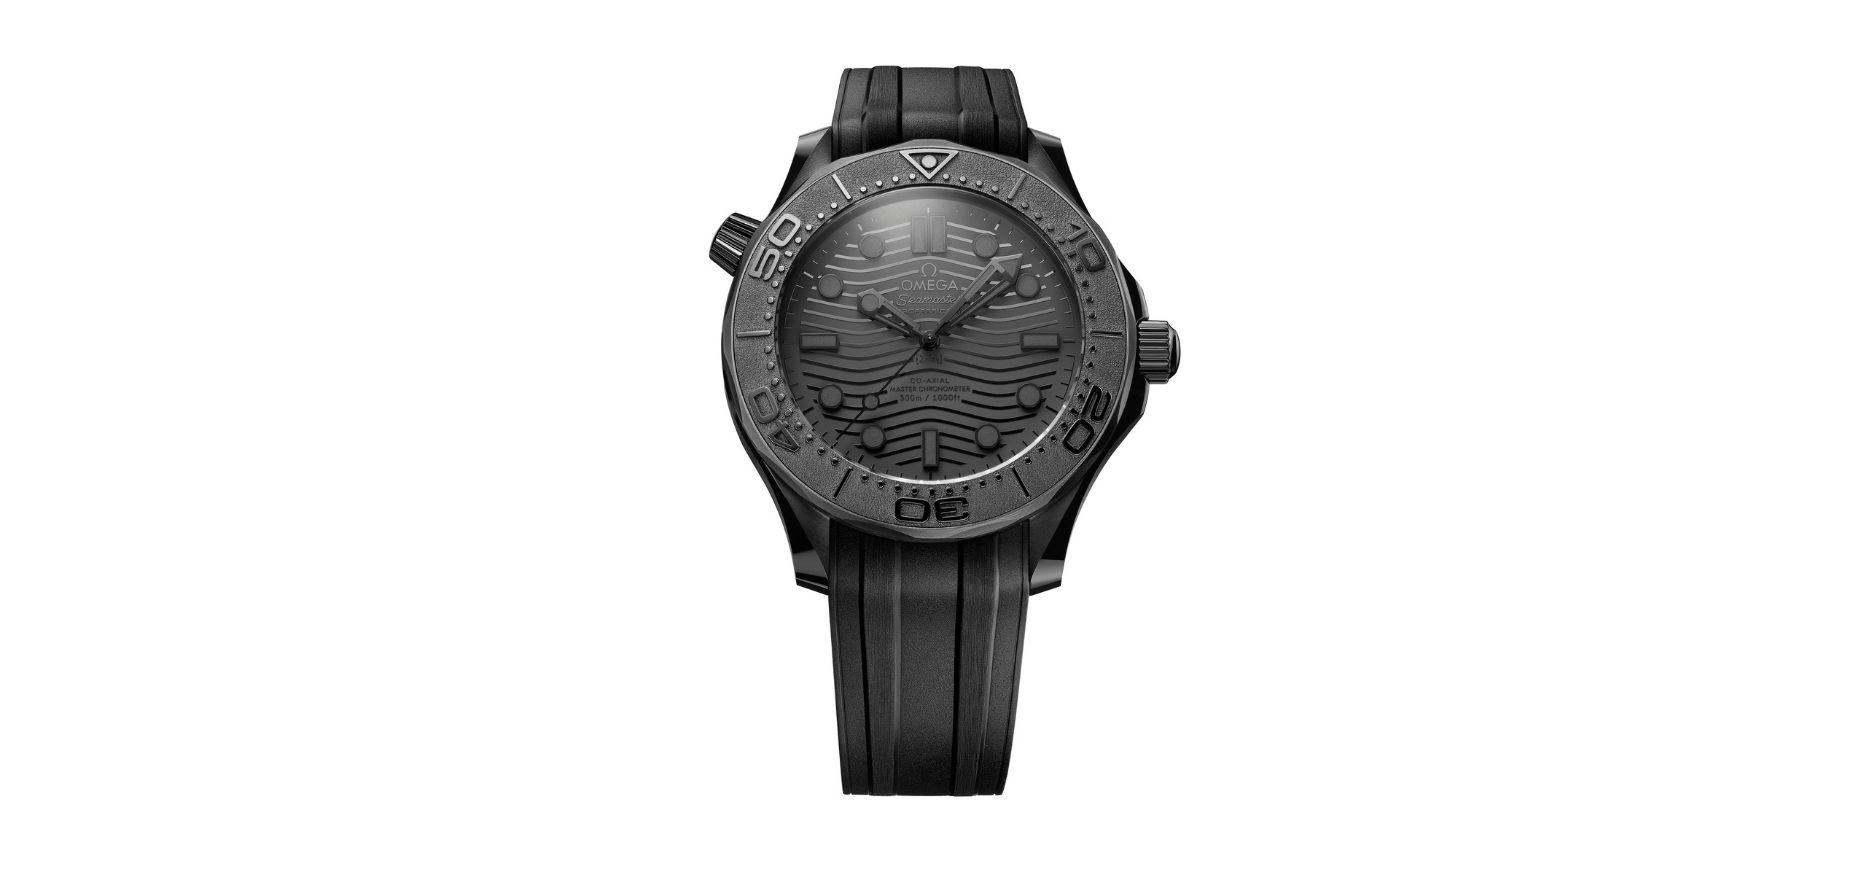 All Black Everything: Omega Seamaster Diver 300m Black Black